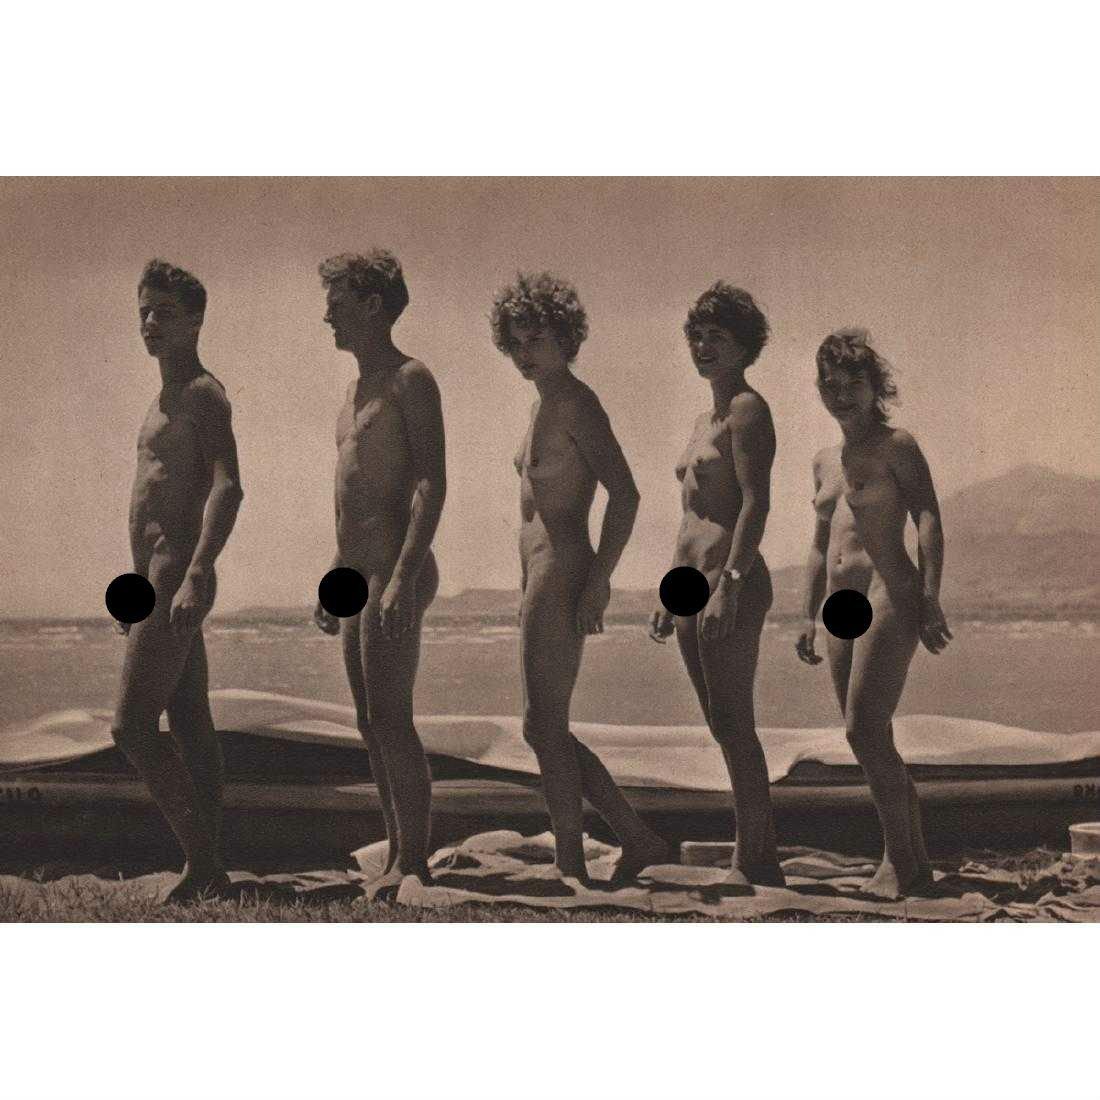 HAJO ORTIL - Nudes